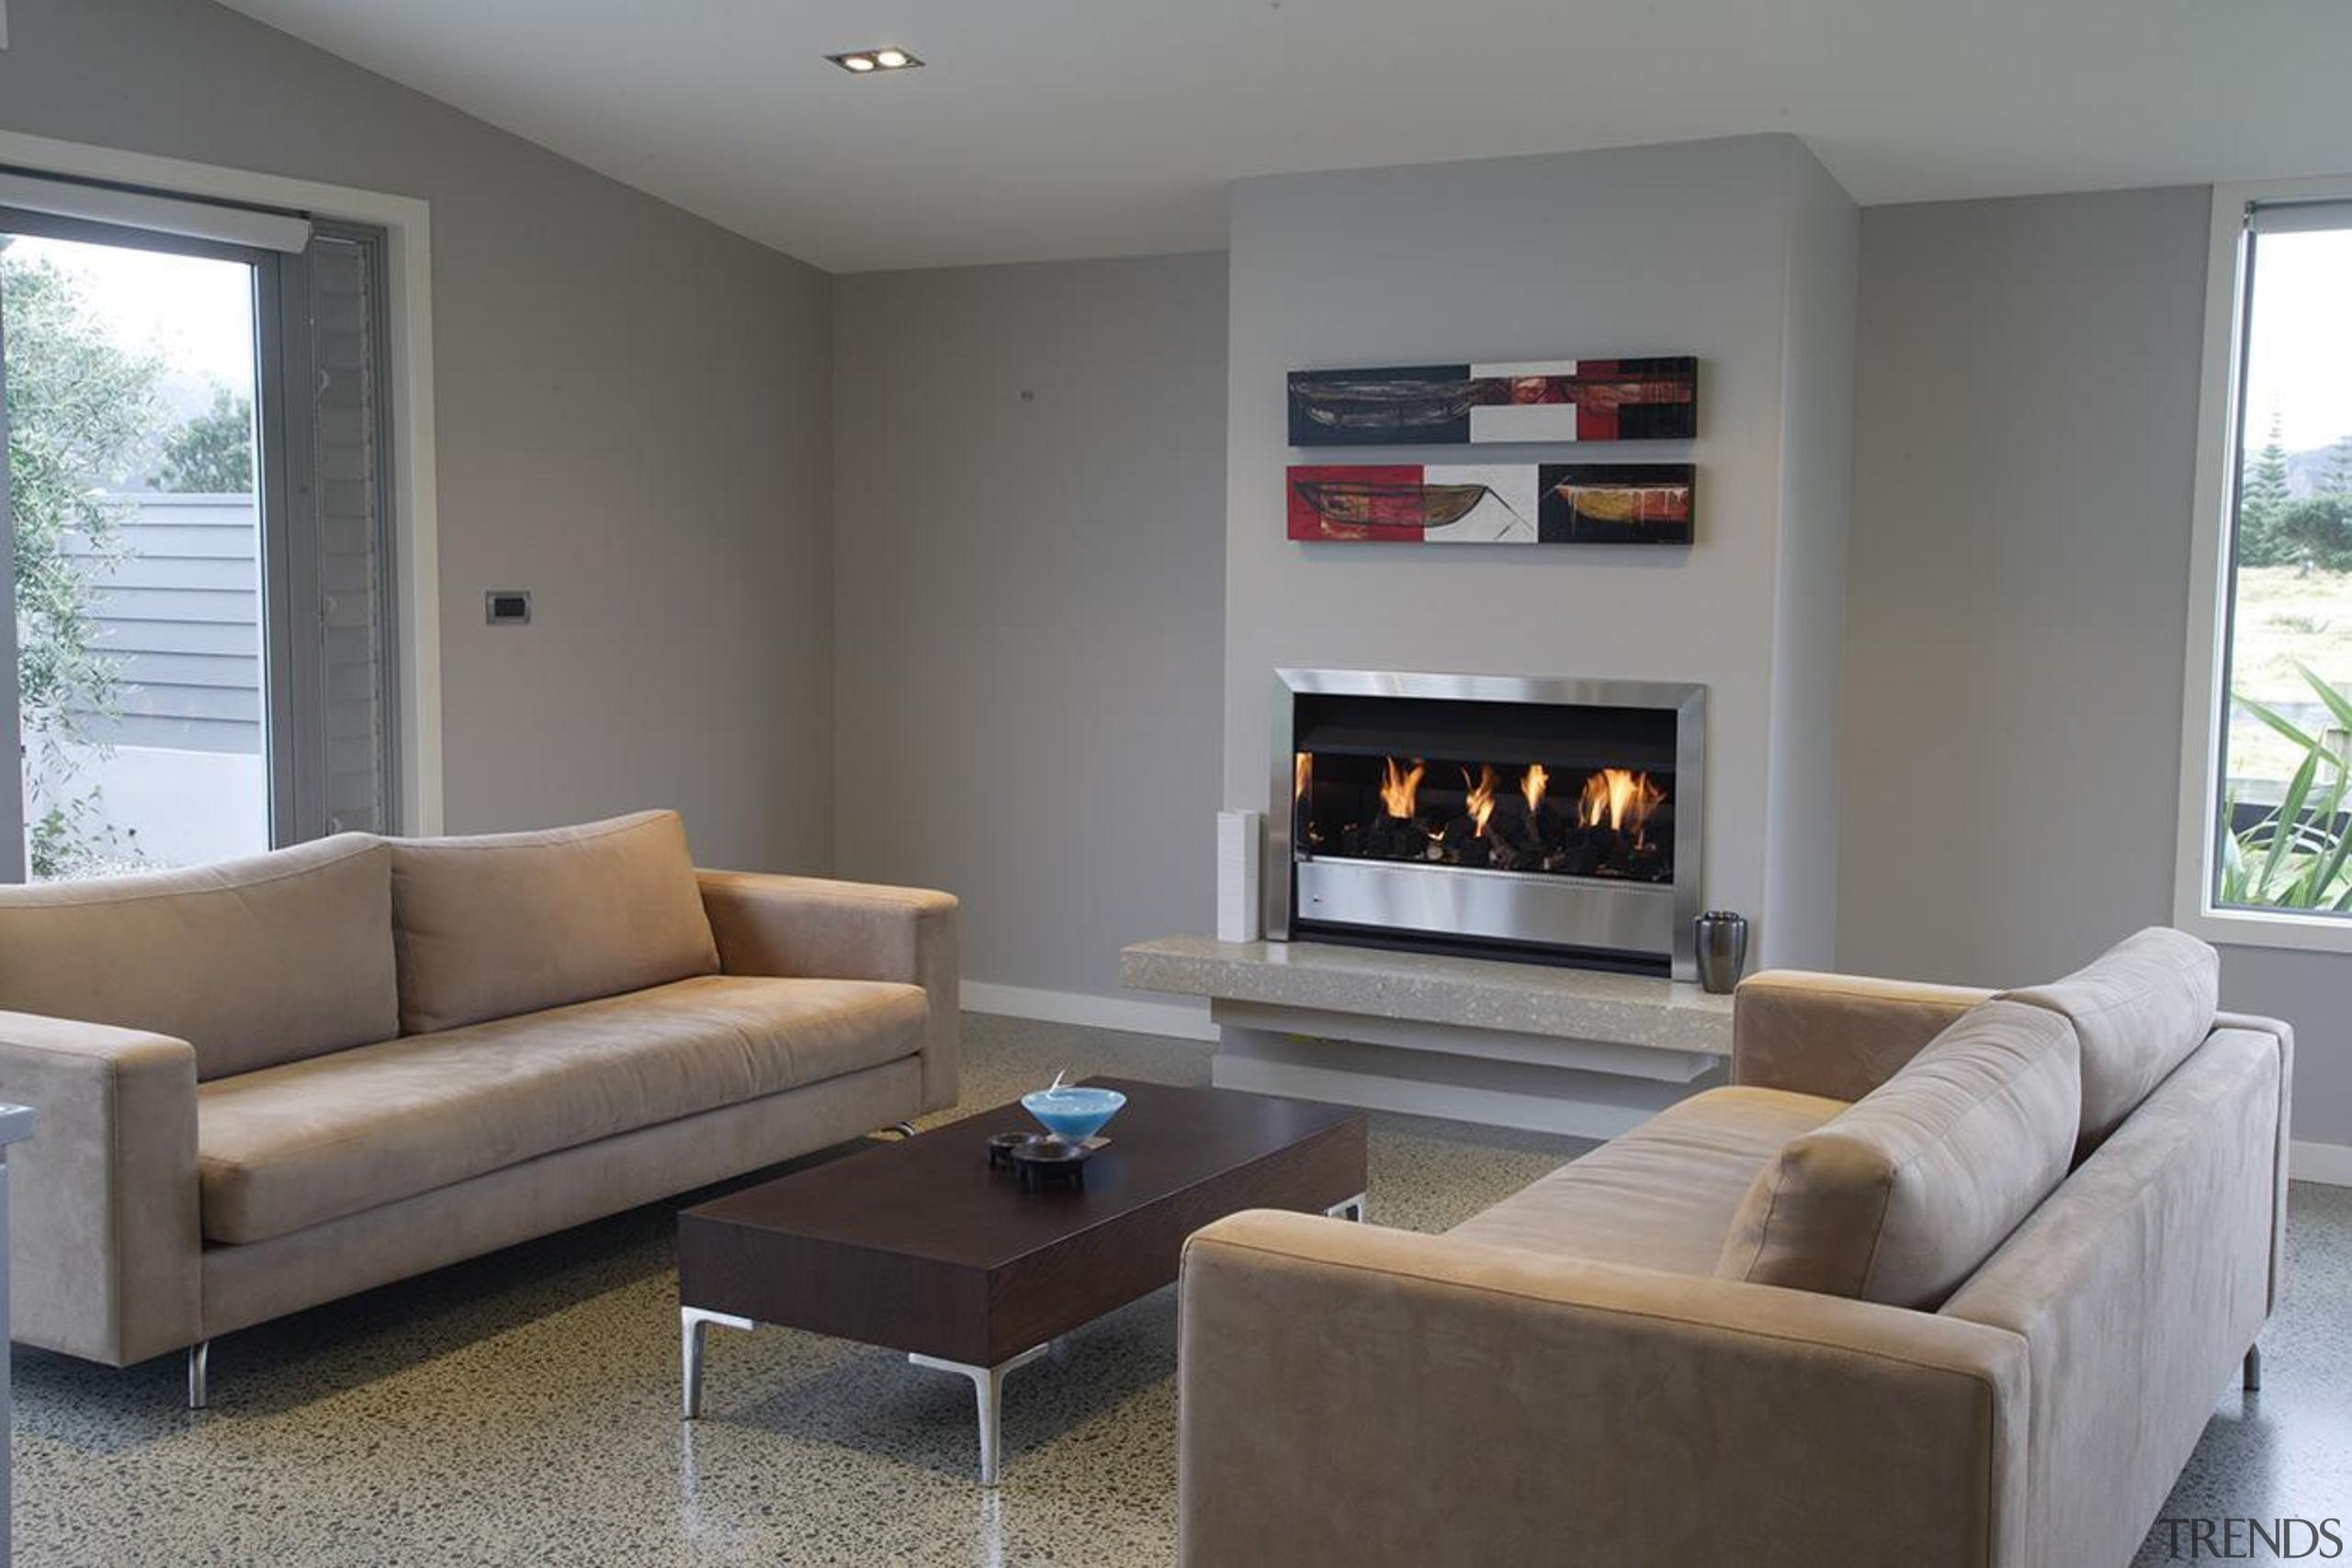 For more information, please visit www.gjgardner.co.nz fireplace, floor, flooring, hearth, interior design, living room, real estate, room, gray